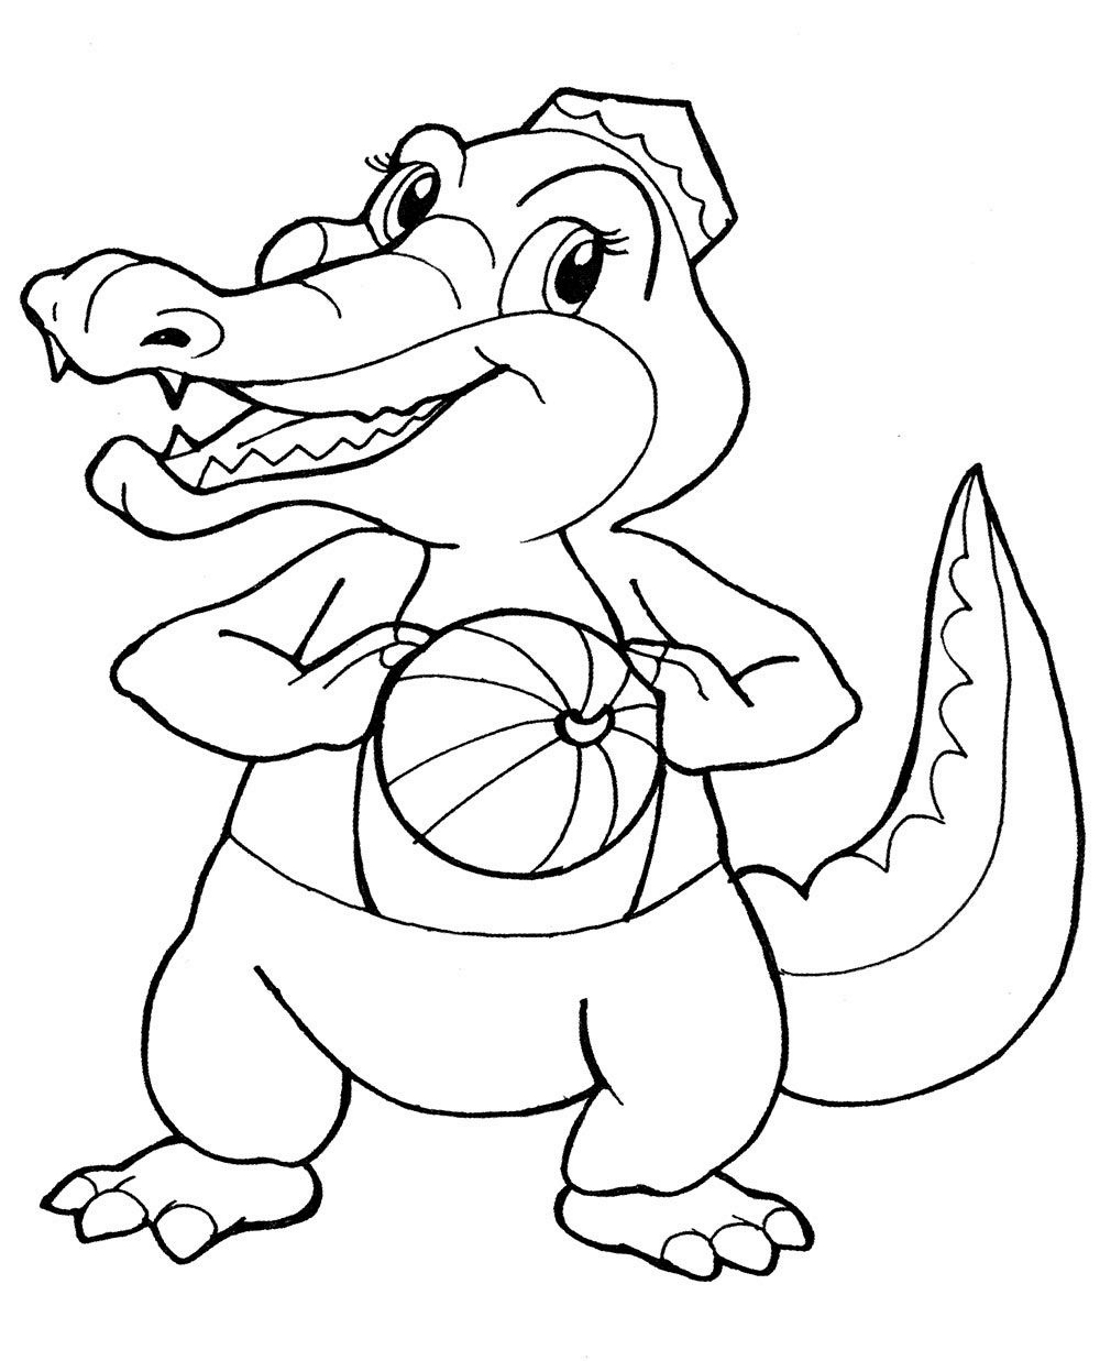 Крокодил с мячиком - раскраска №1302 | Printonic.ru